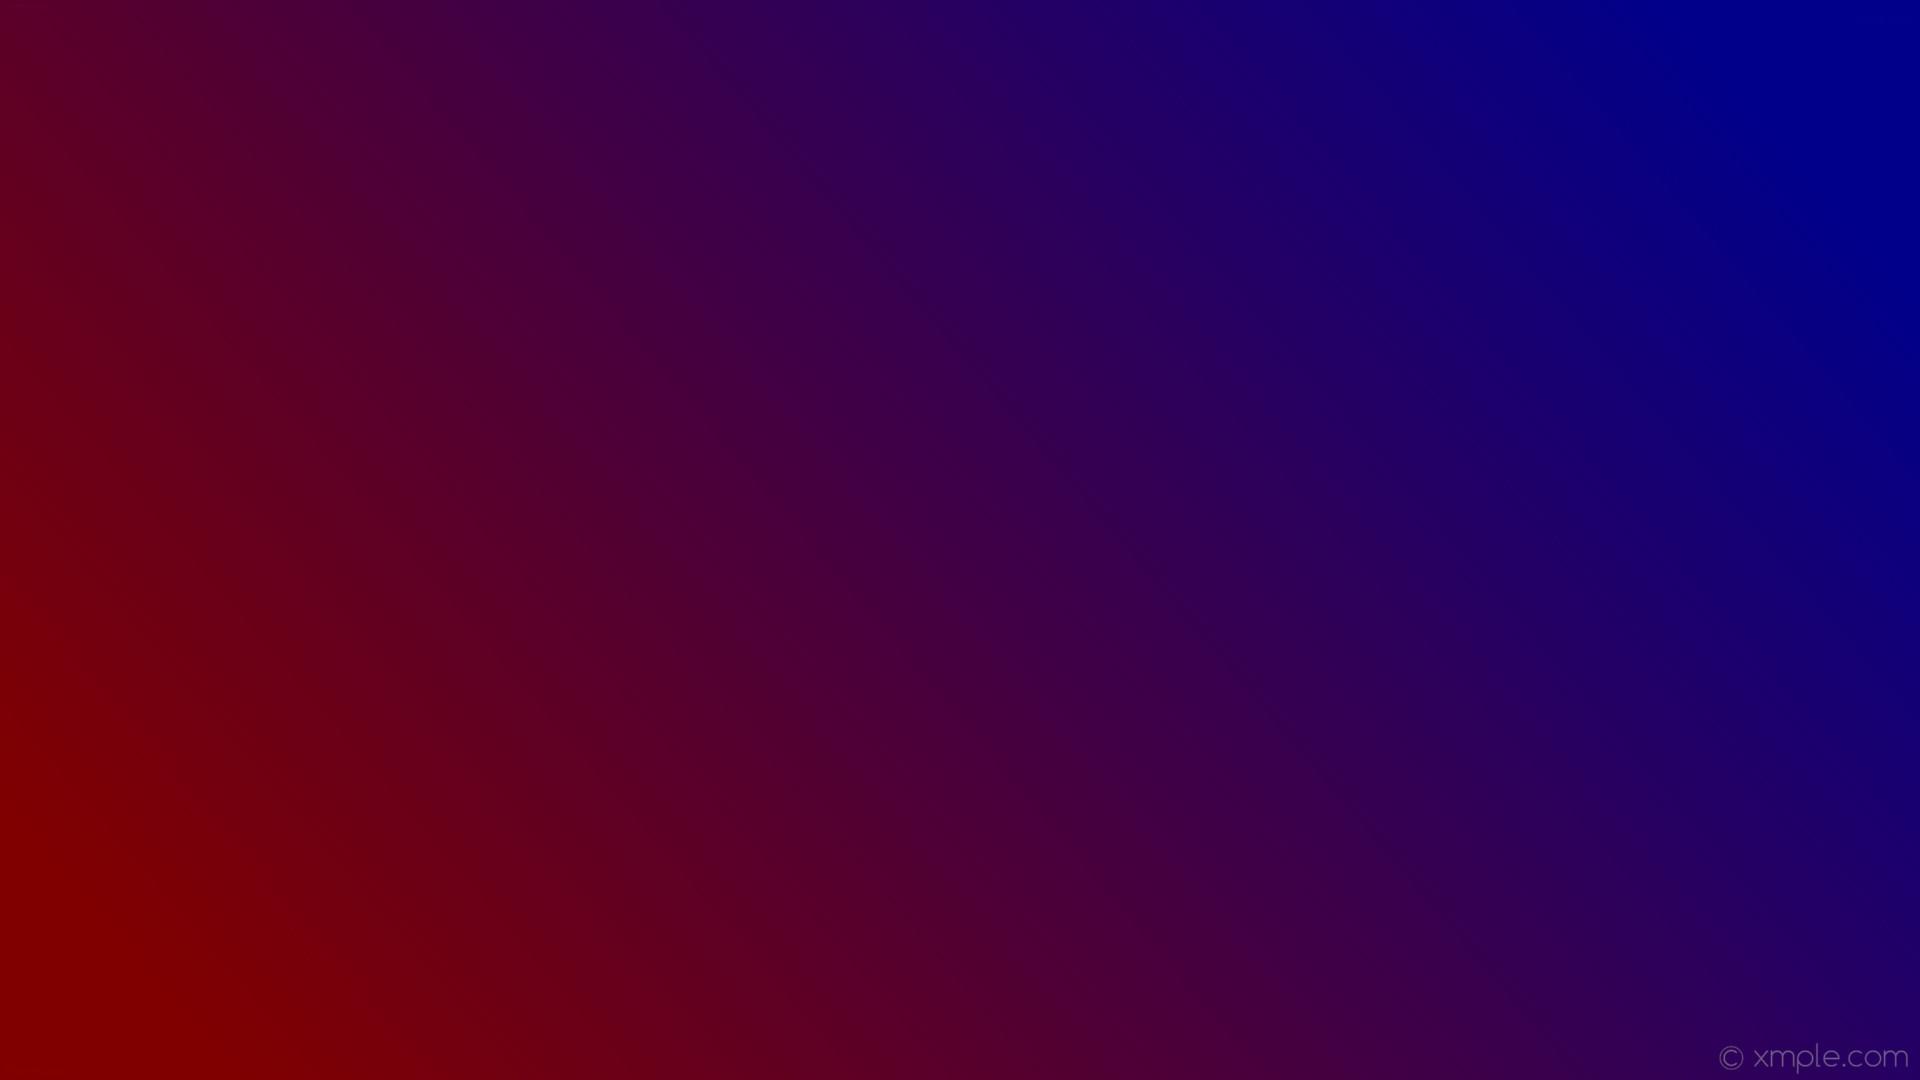 wallpaper blue brown gradient linear dark blue maroon #00008b #800000 15°